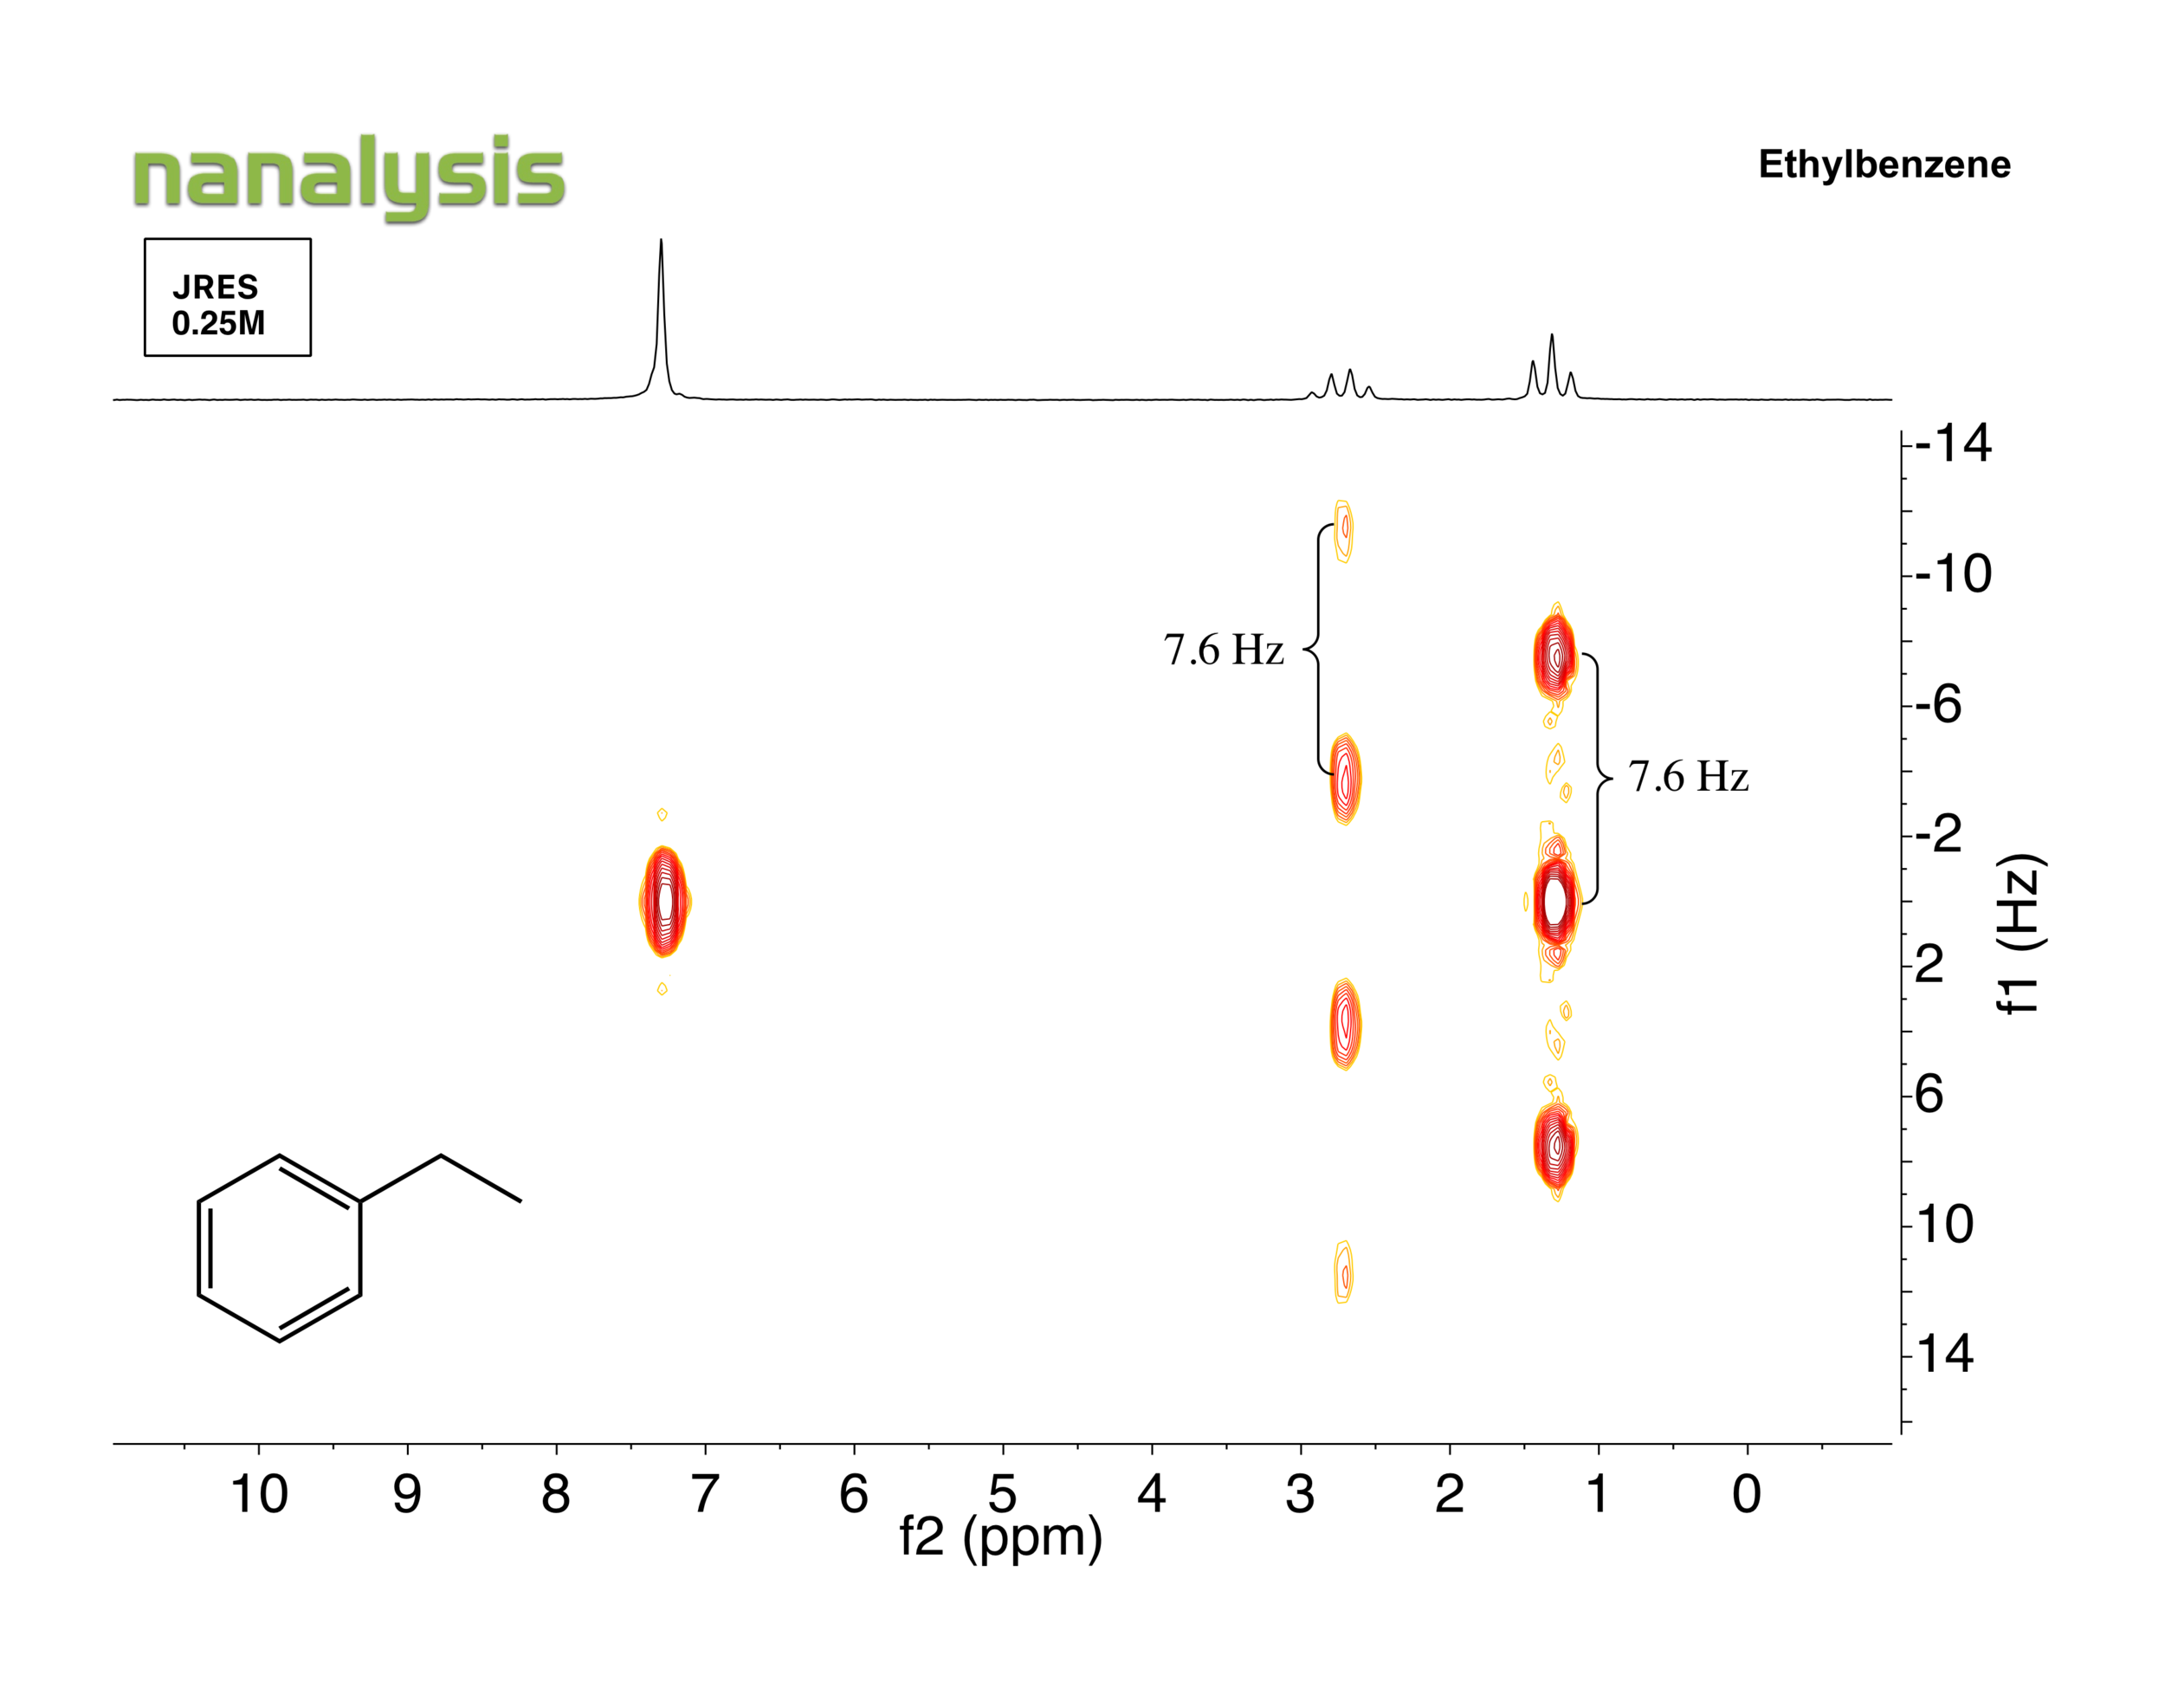 benchtopNMR-JRES-ethylbenzene.png